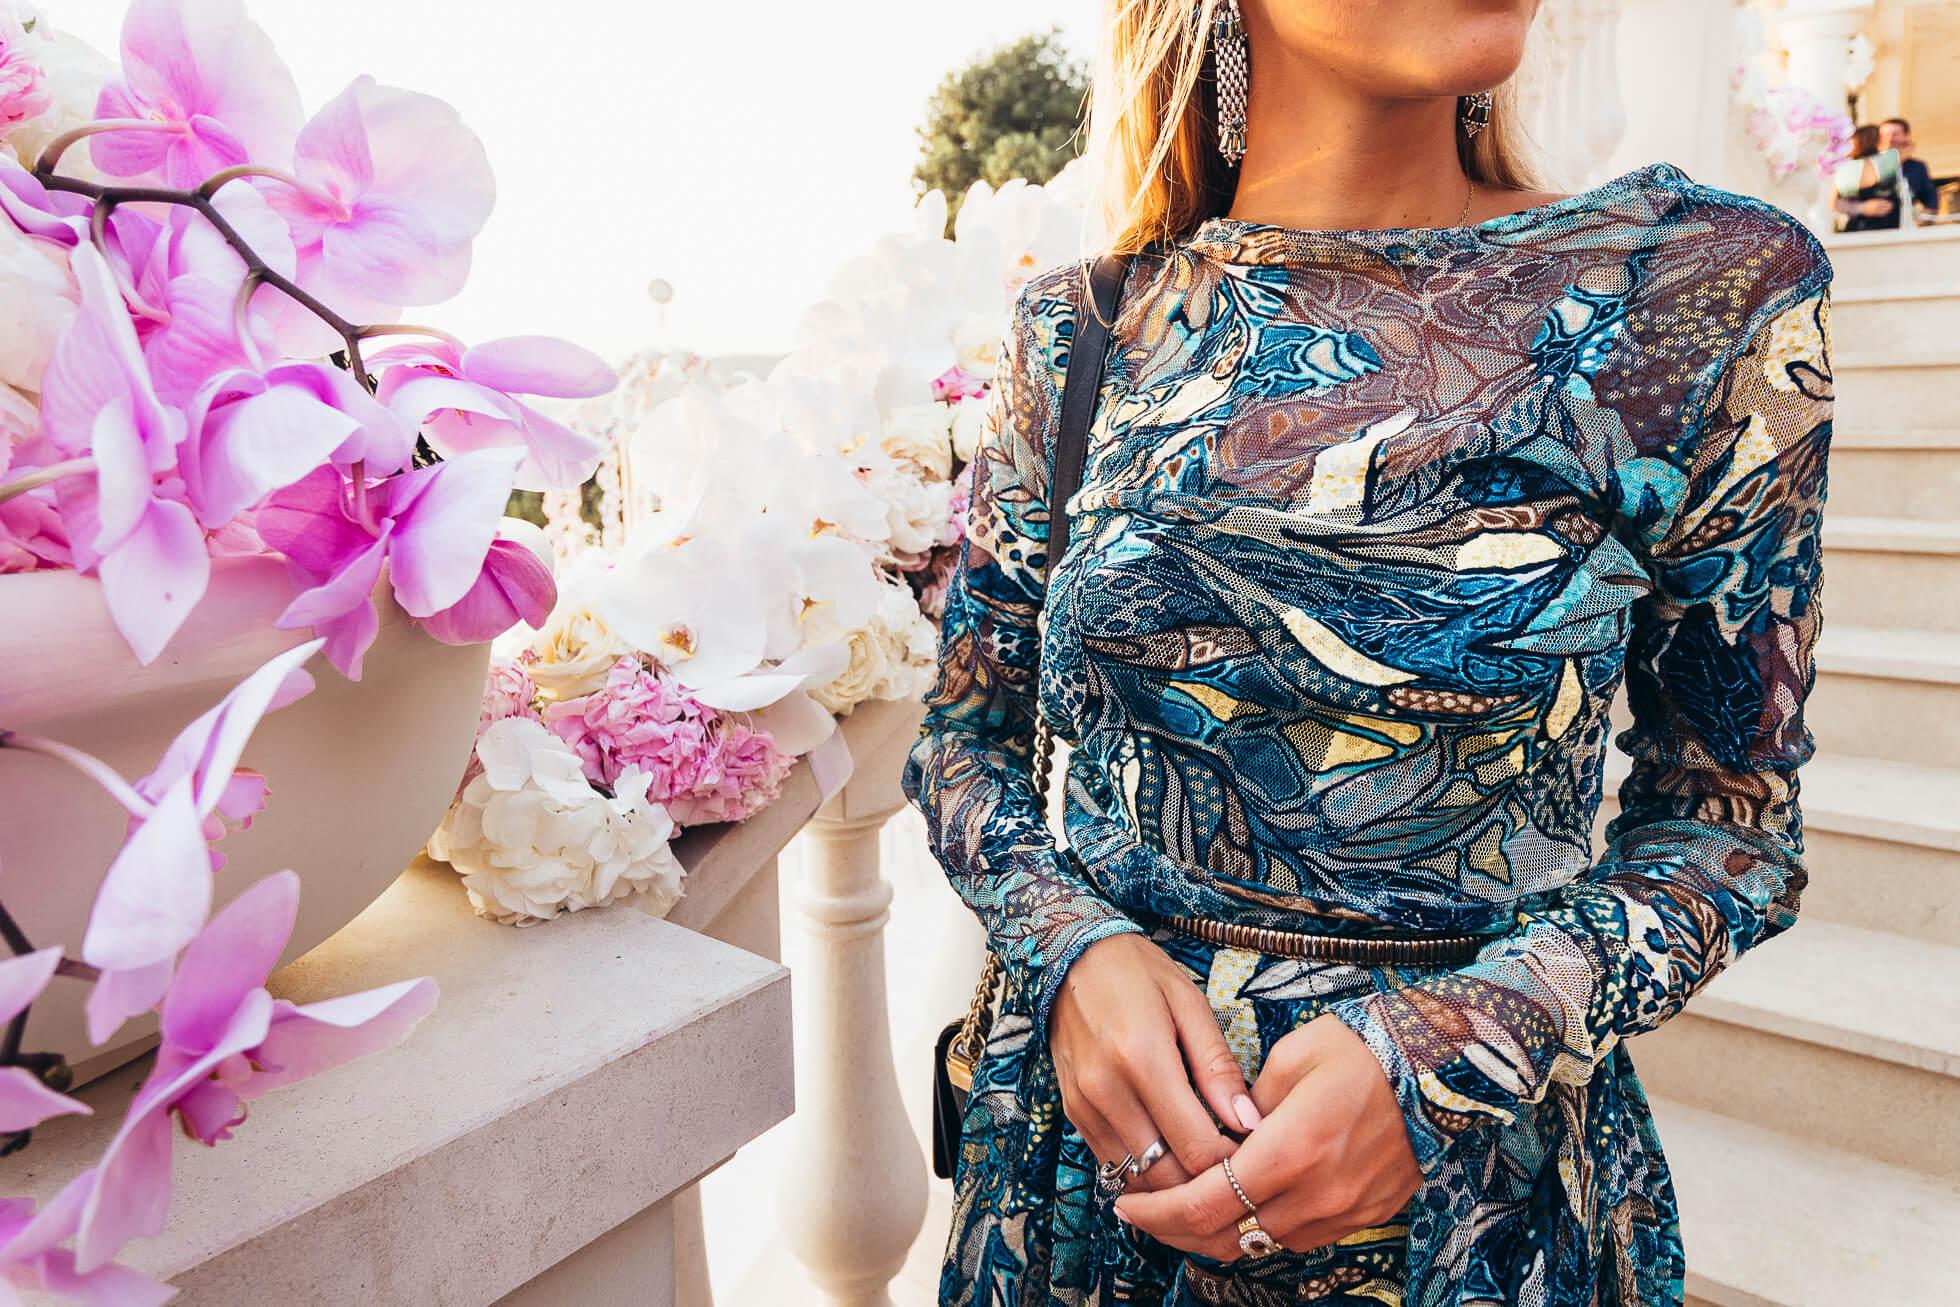 janni-deler-wedding-lookJ1130350